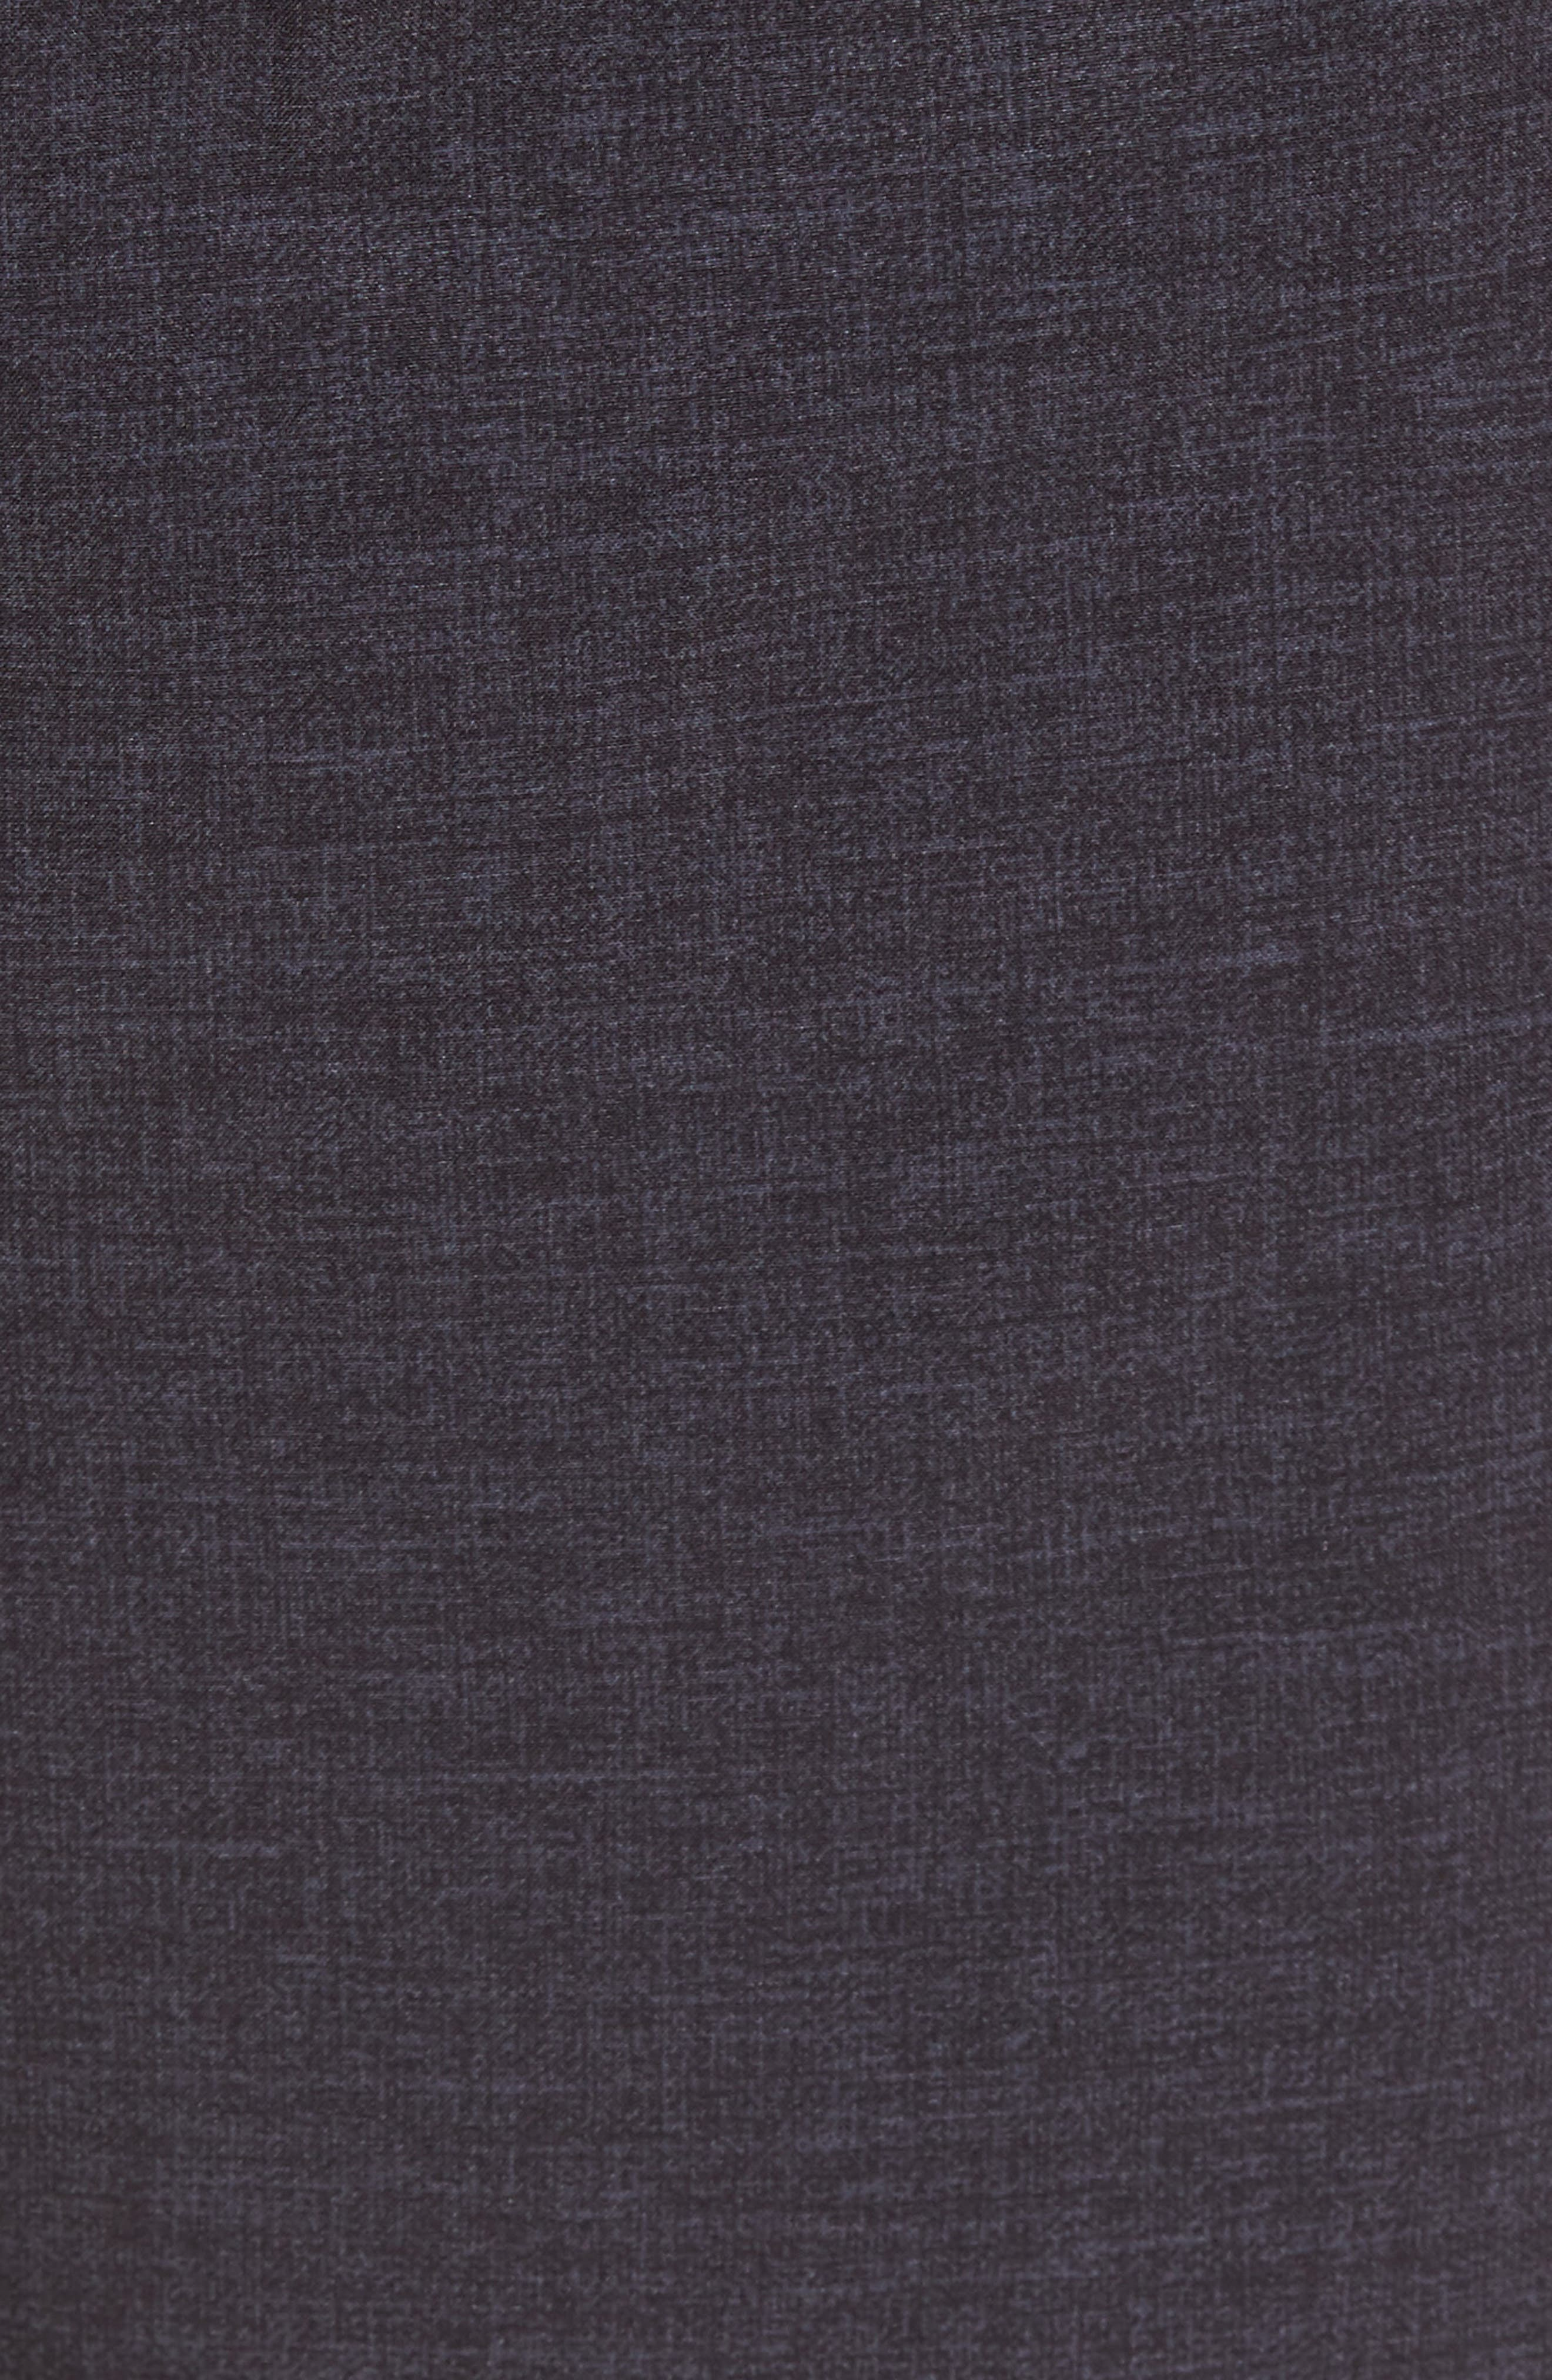 Spencer Jogger Pants,                             Alternate thumbnail 5, color,                             Black Heather